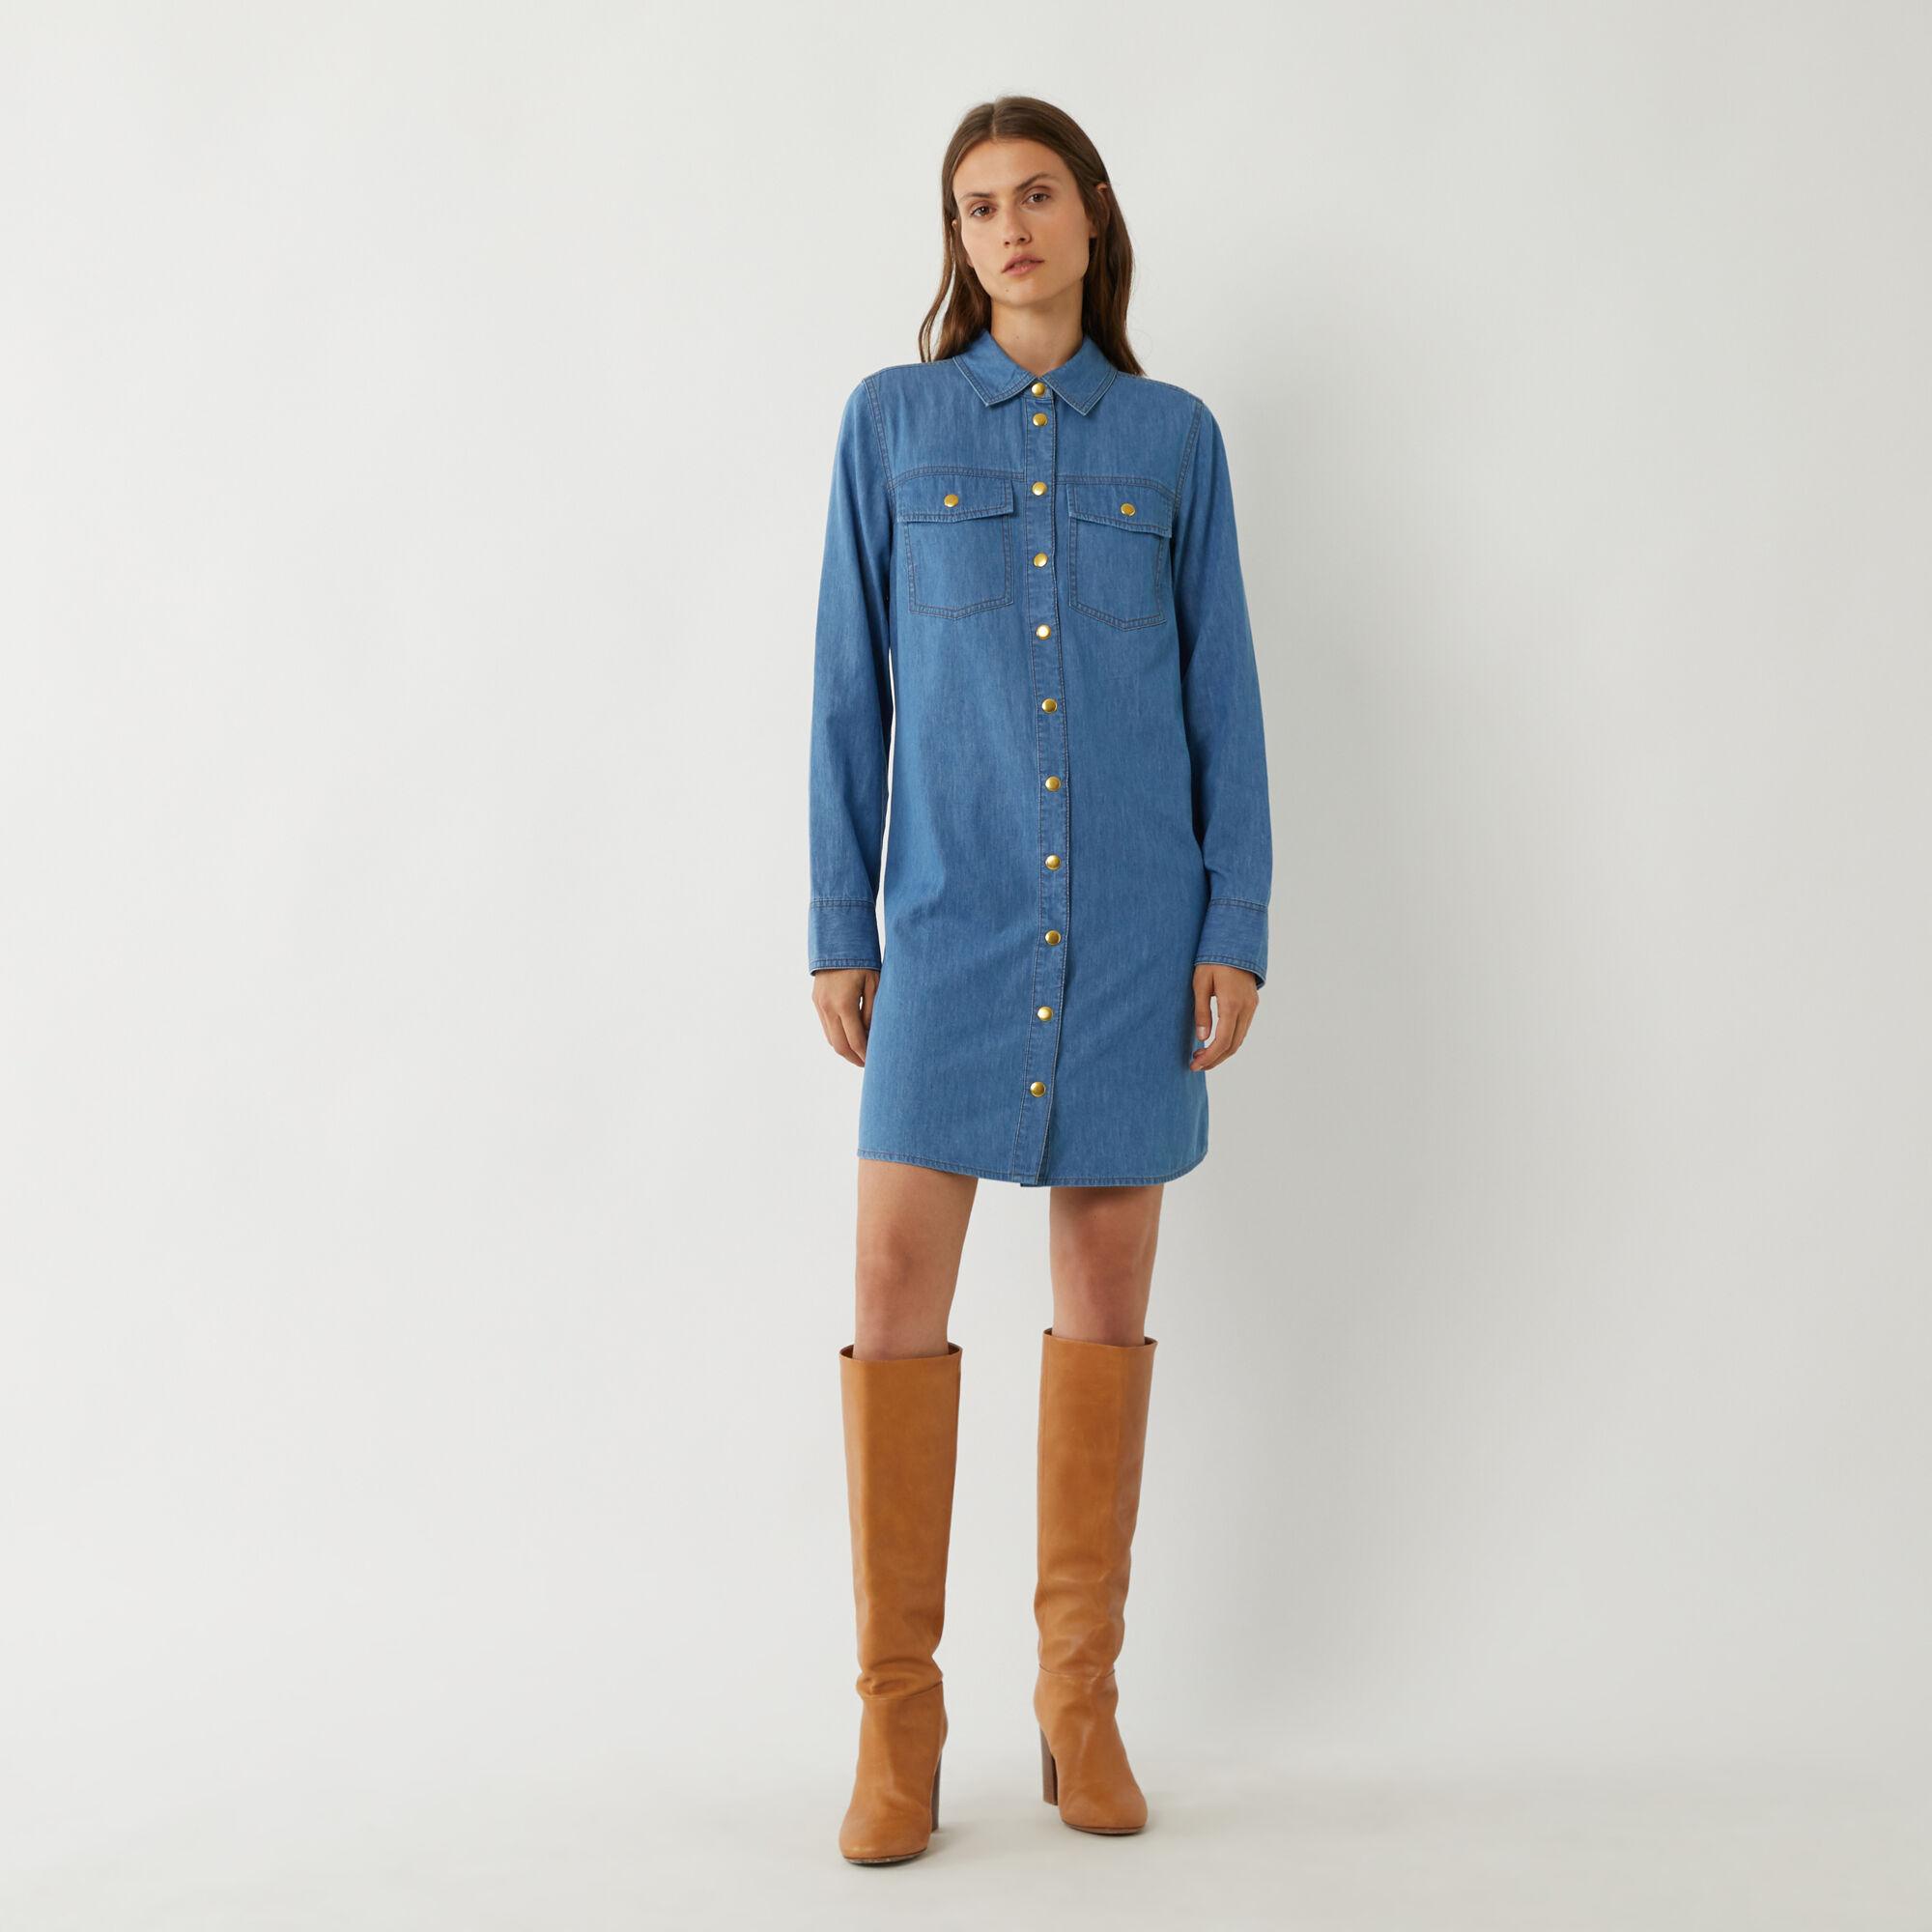 Warehouse, DENIM MINI SHIRT DRESS Mid Wash Denim 1